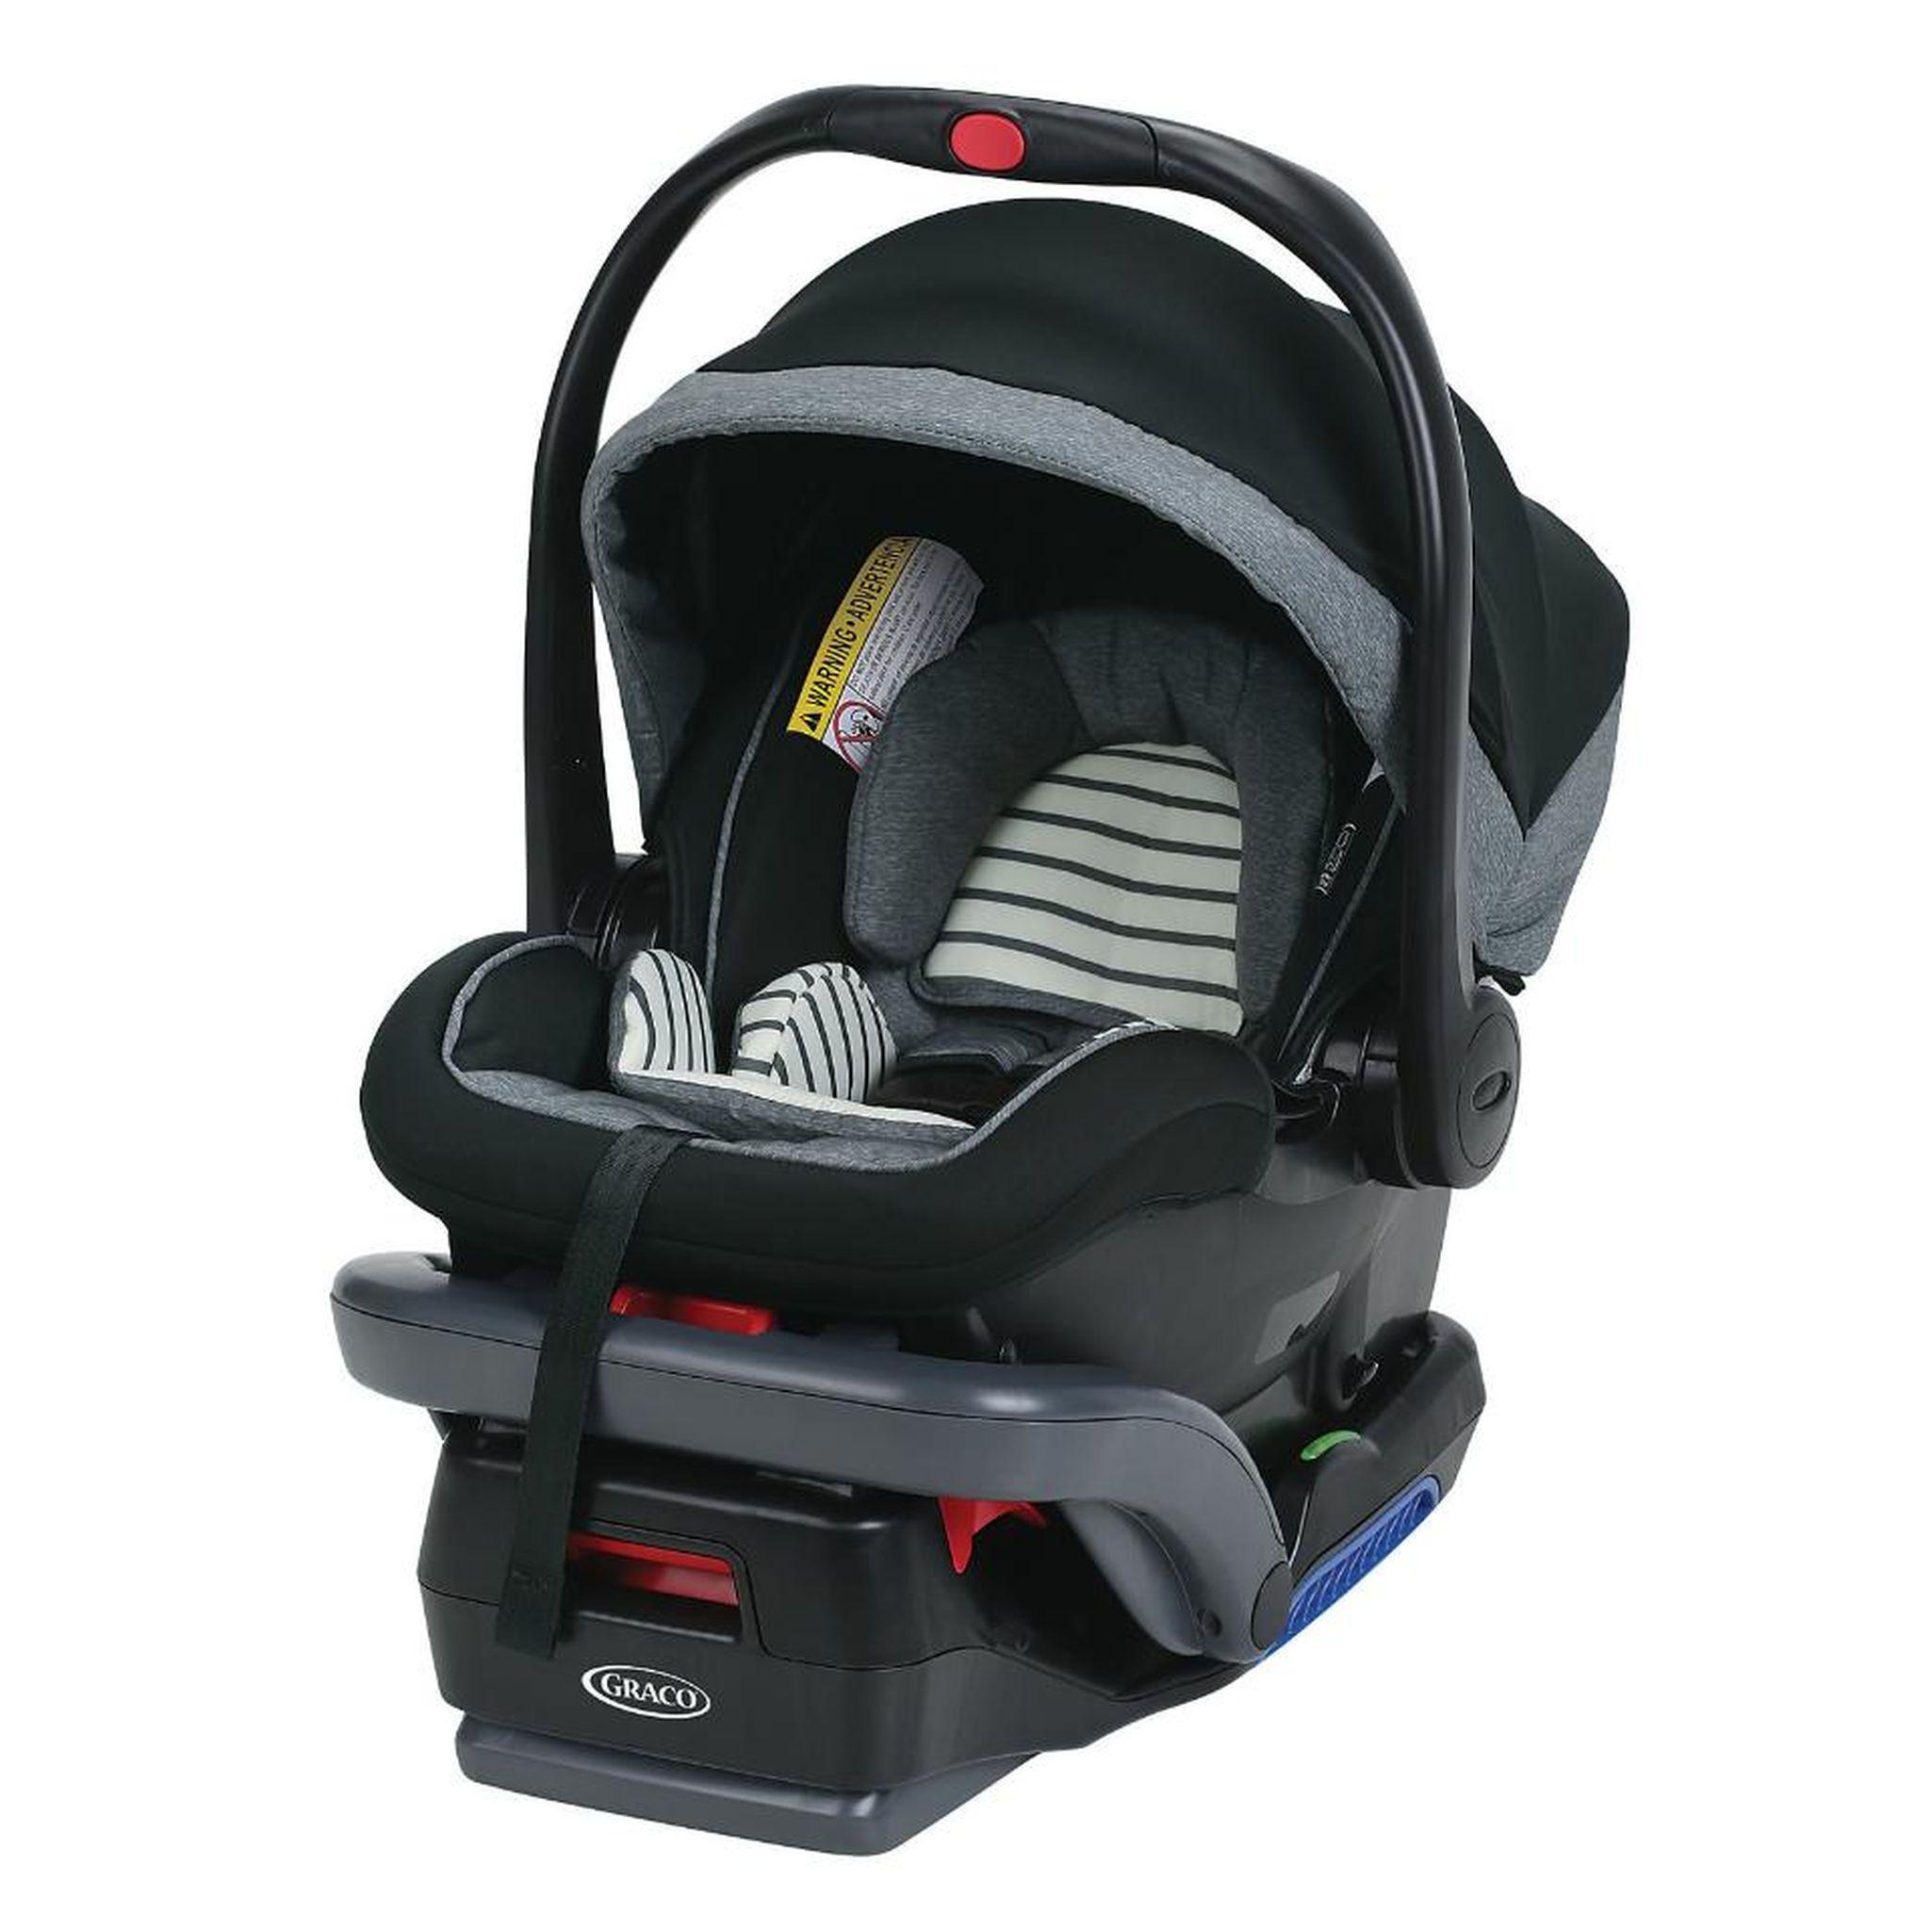 Graco SnugRide SnugLock 35 DLX Infant Car Seat Holt